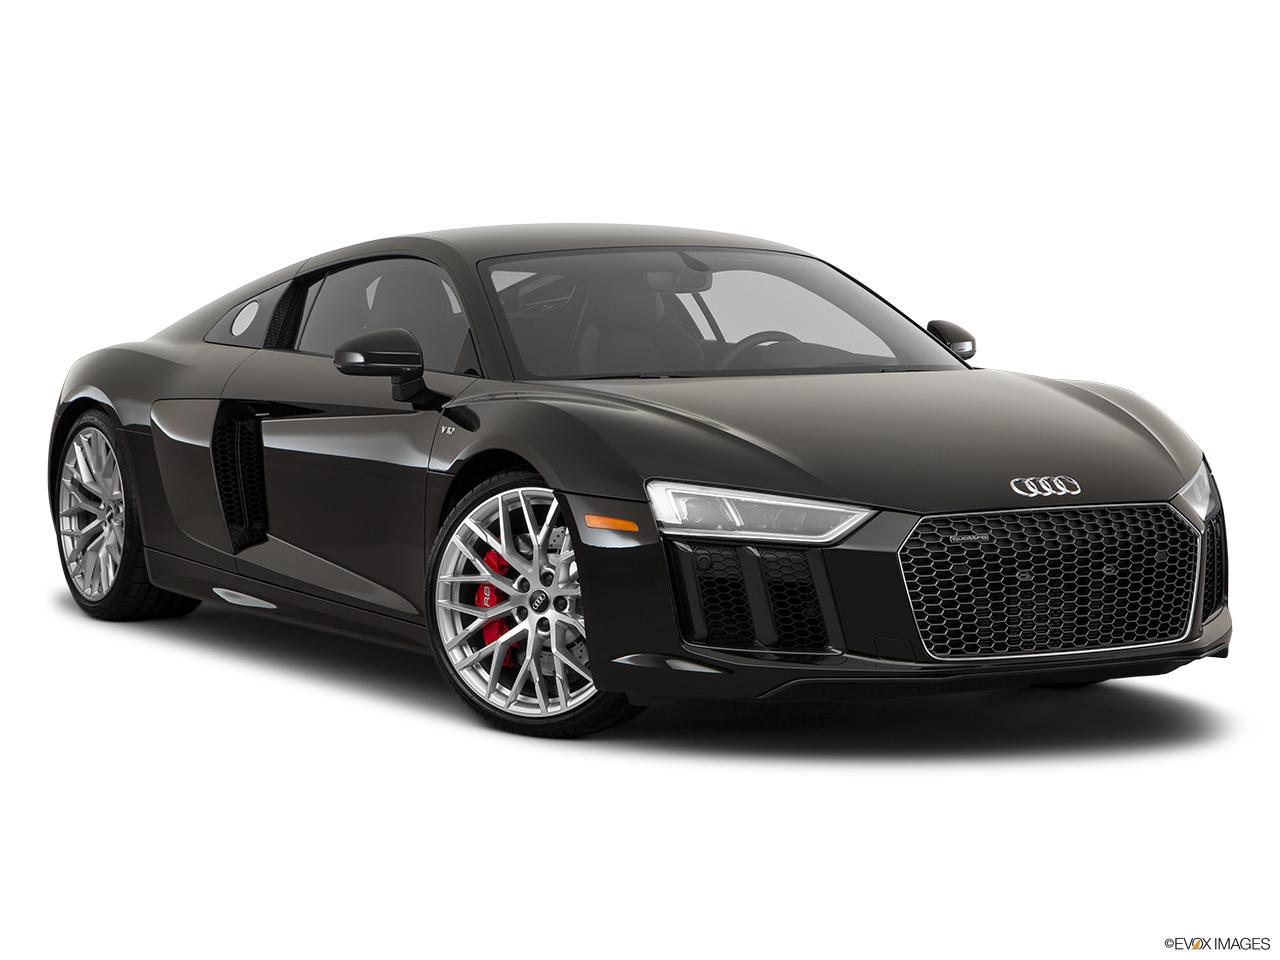 car pictures list for audi r8 coupe 2018 5 2 v10 plus kuwait yallamotor. Black Bedroom Furniture Sets. Home Design Ideas